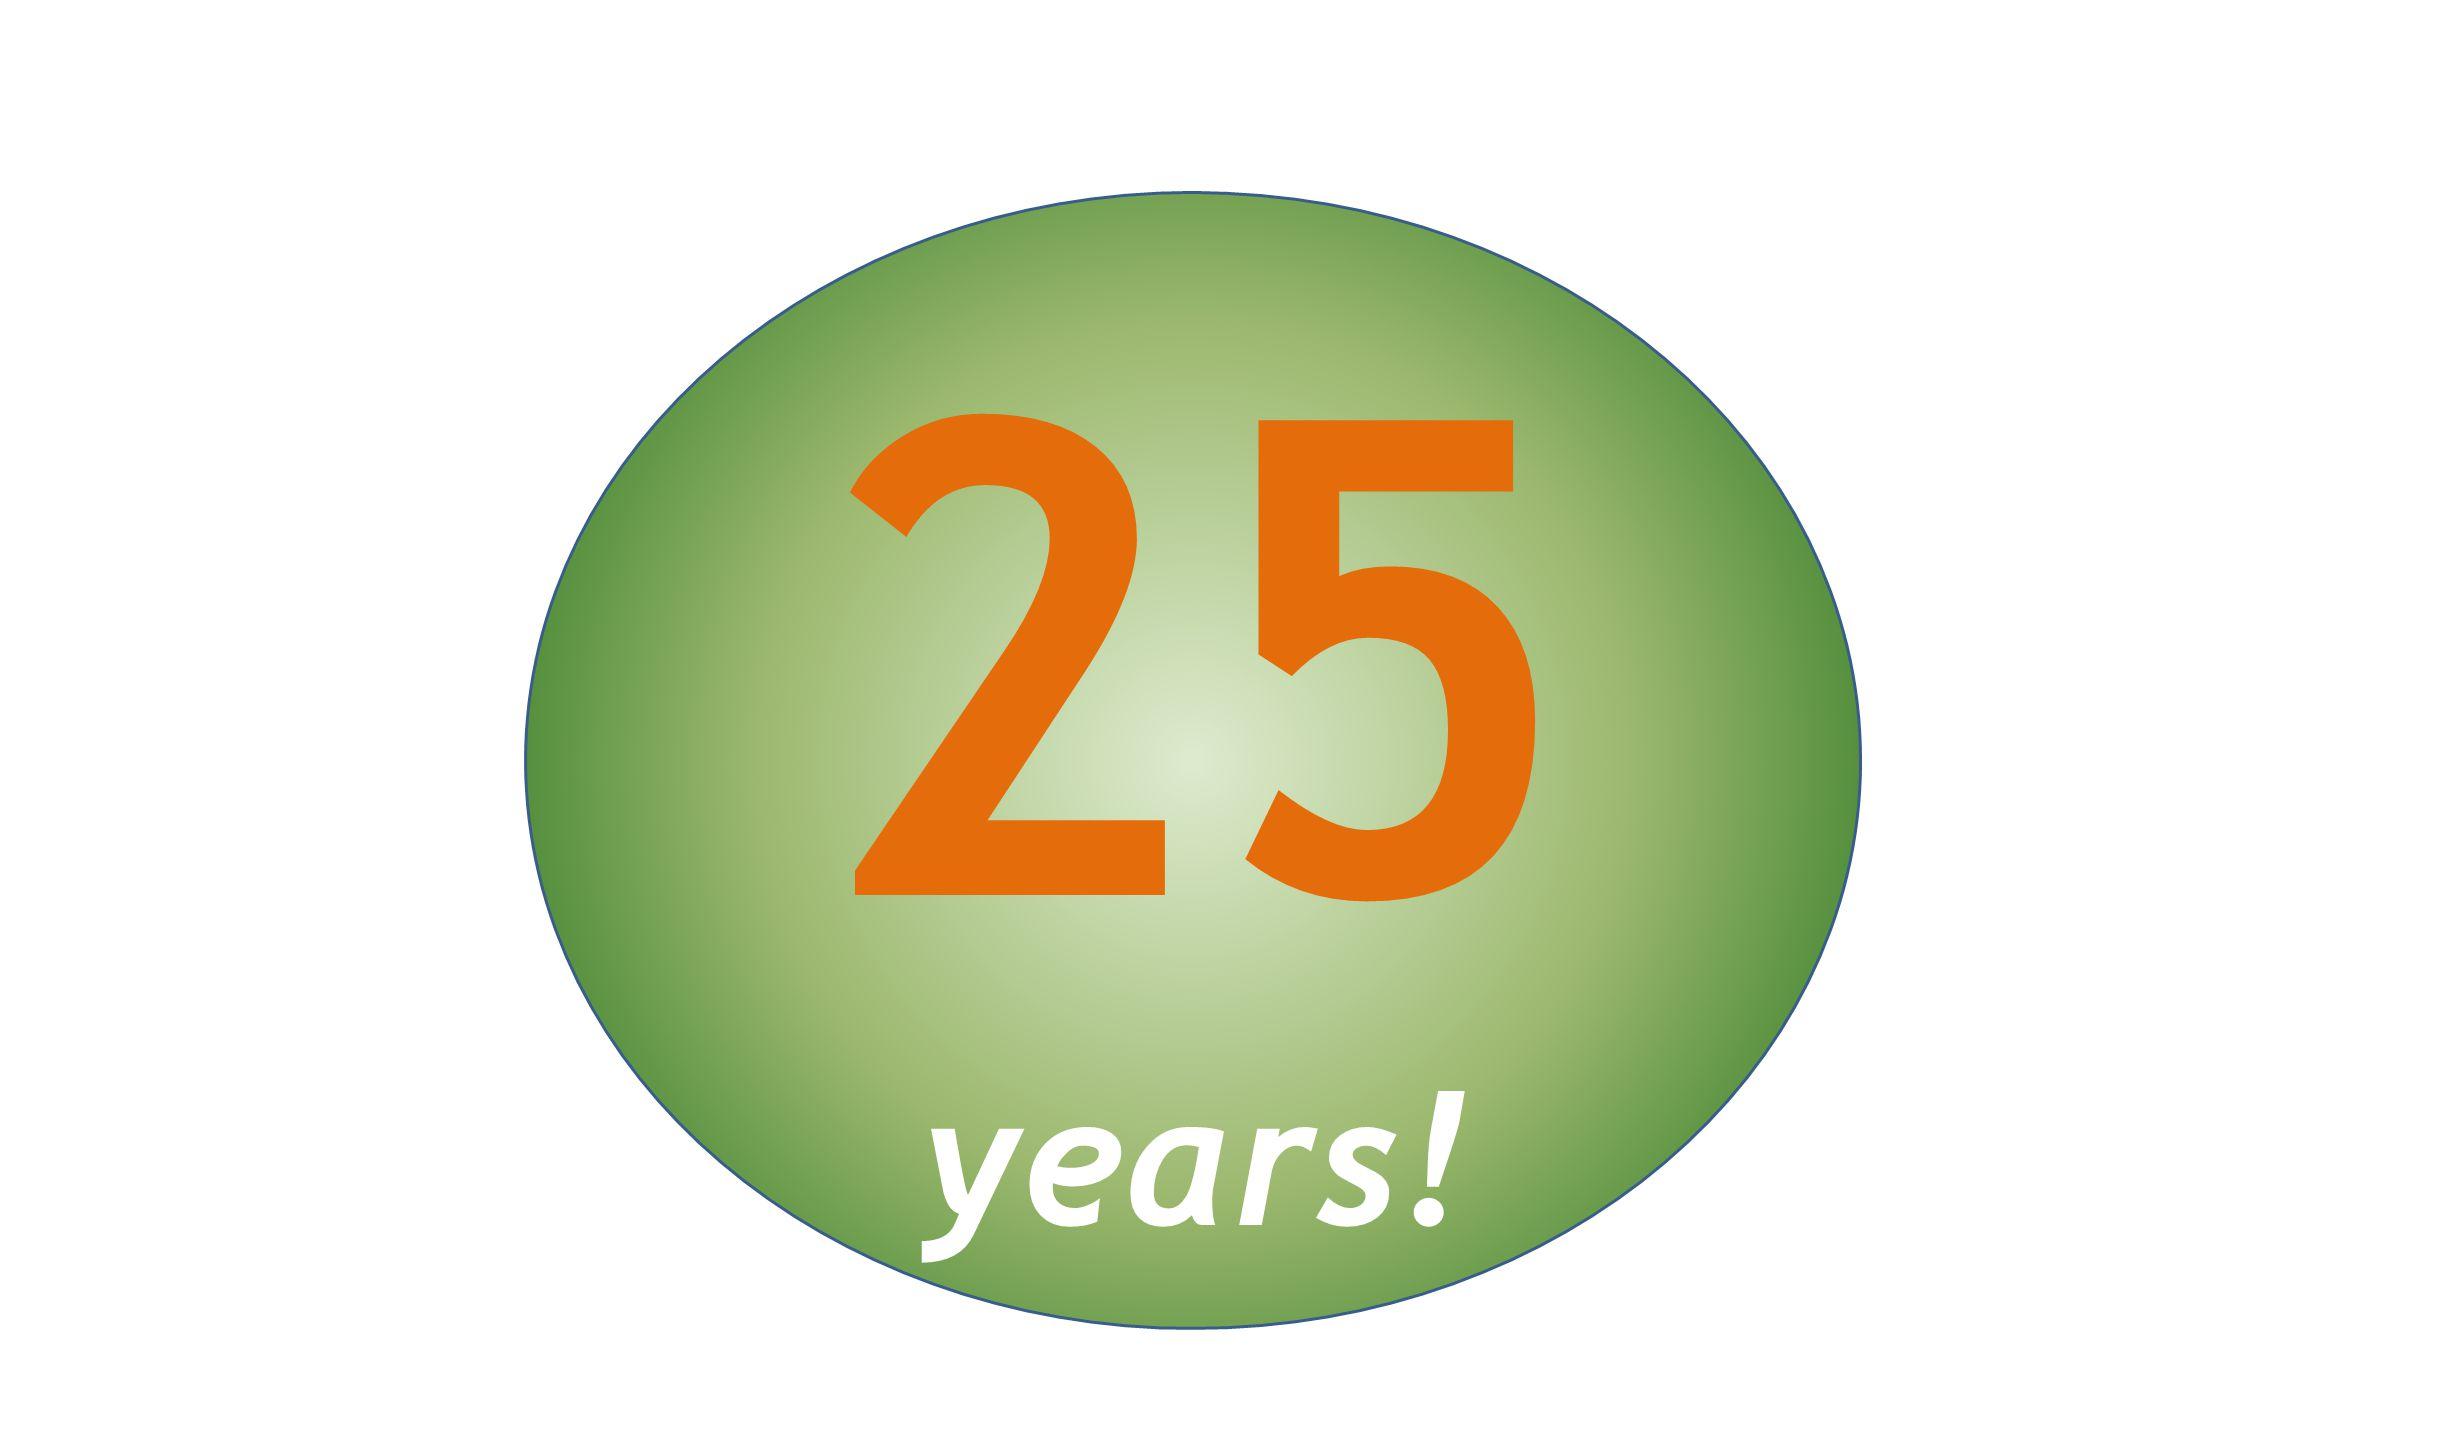 25 years!